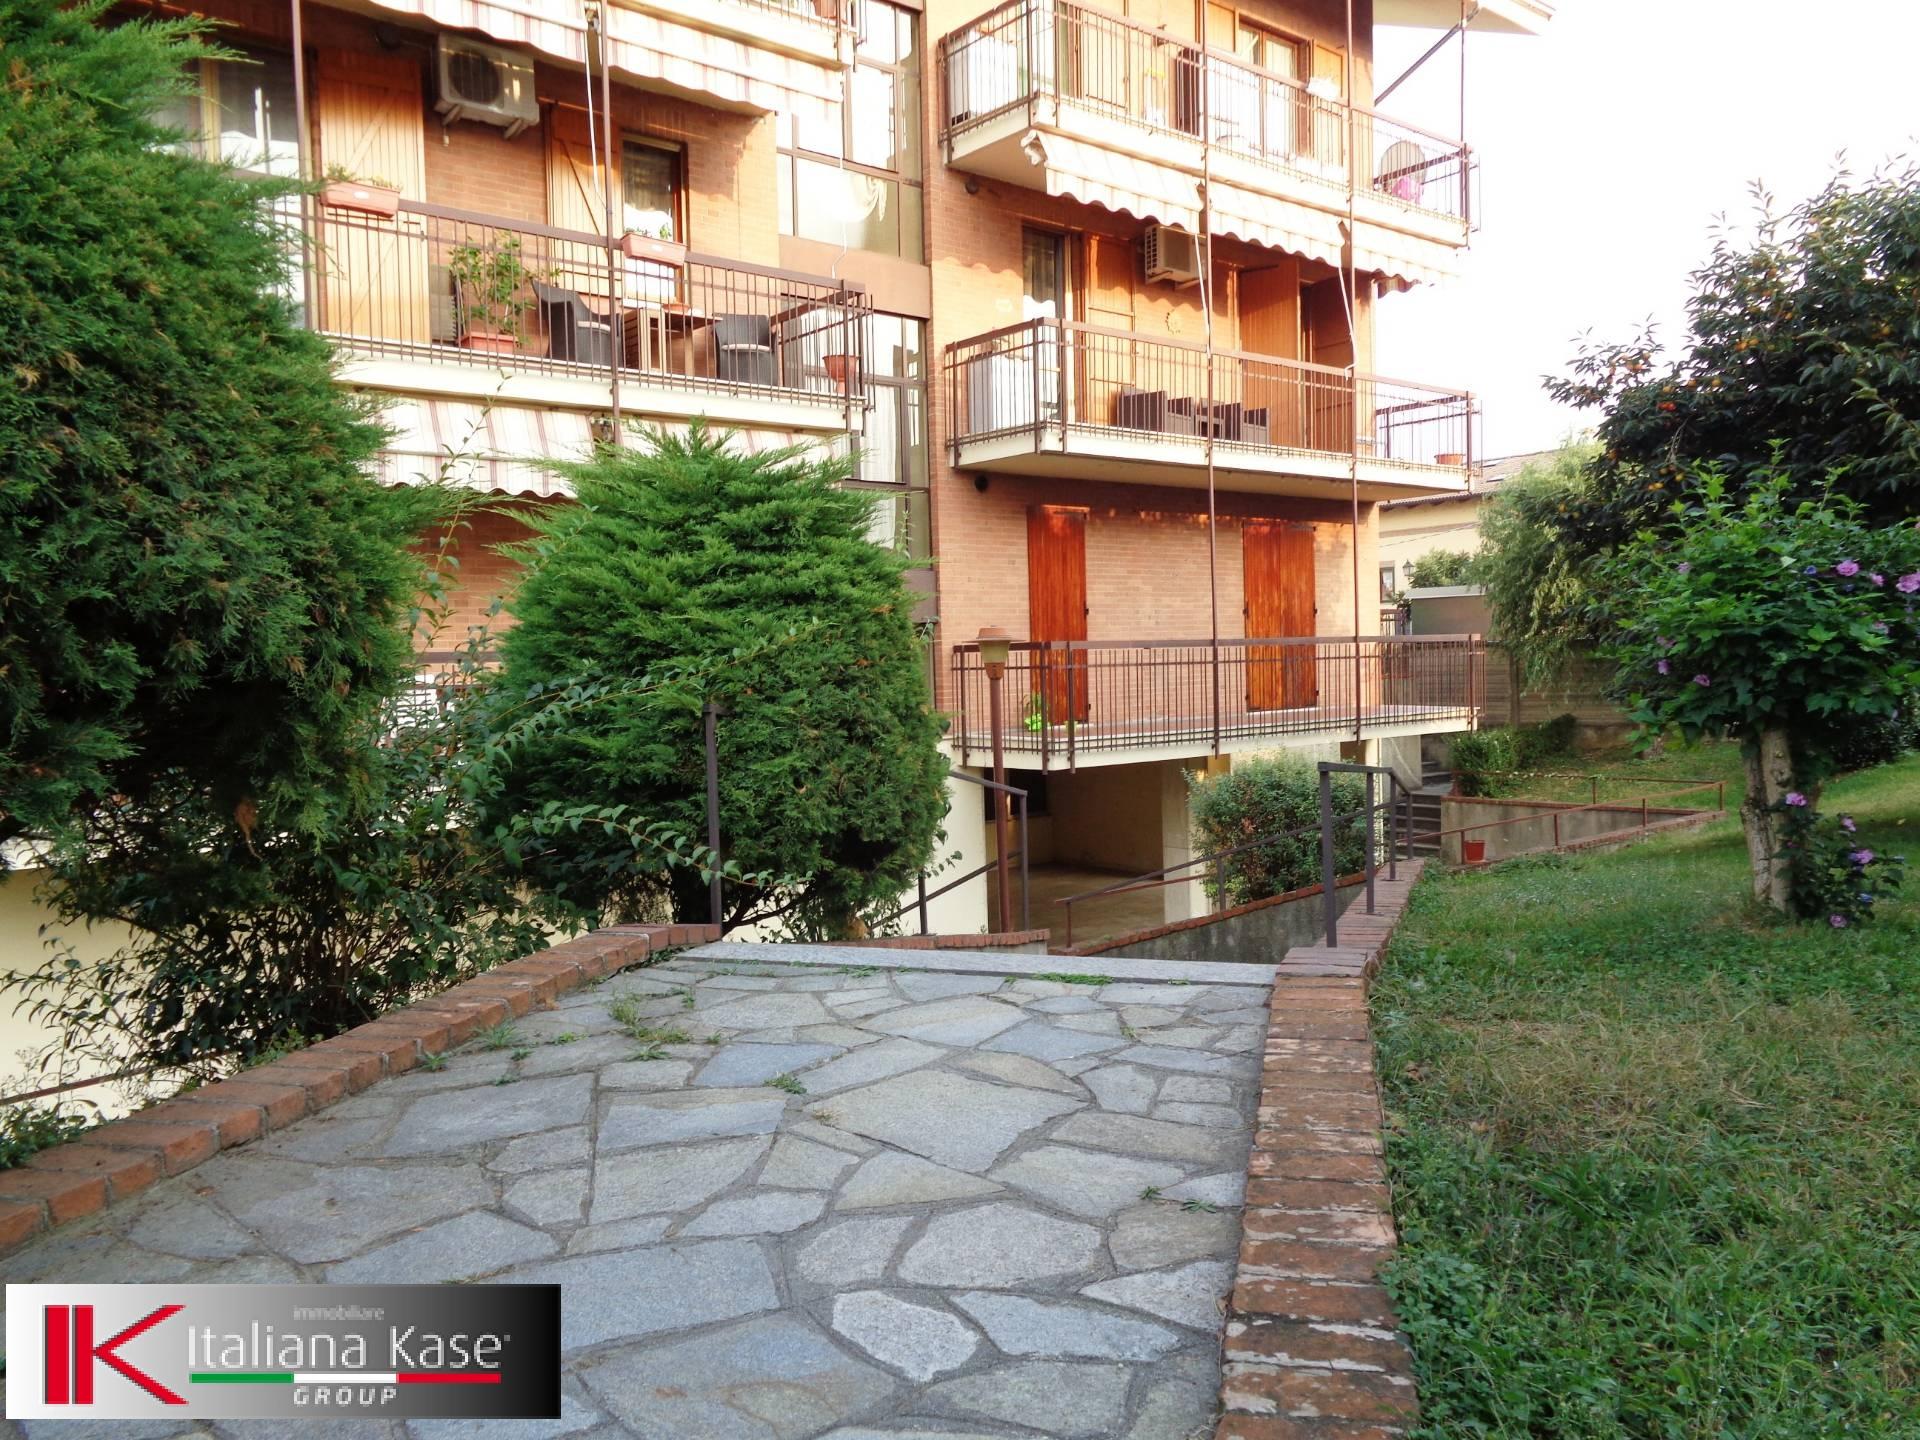 Bilocale Torrazza Piemonte  1